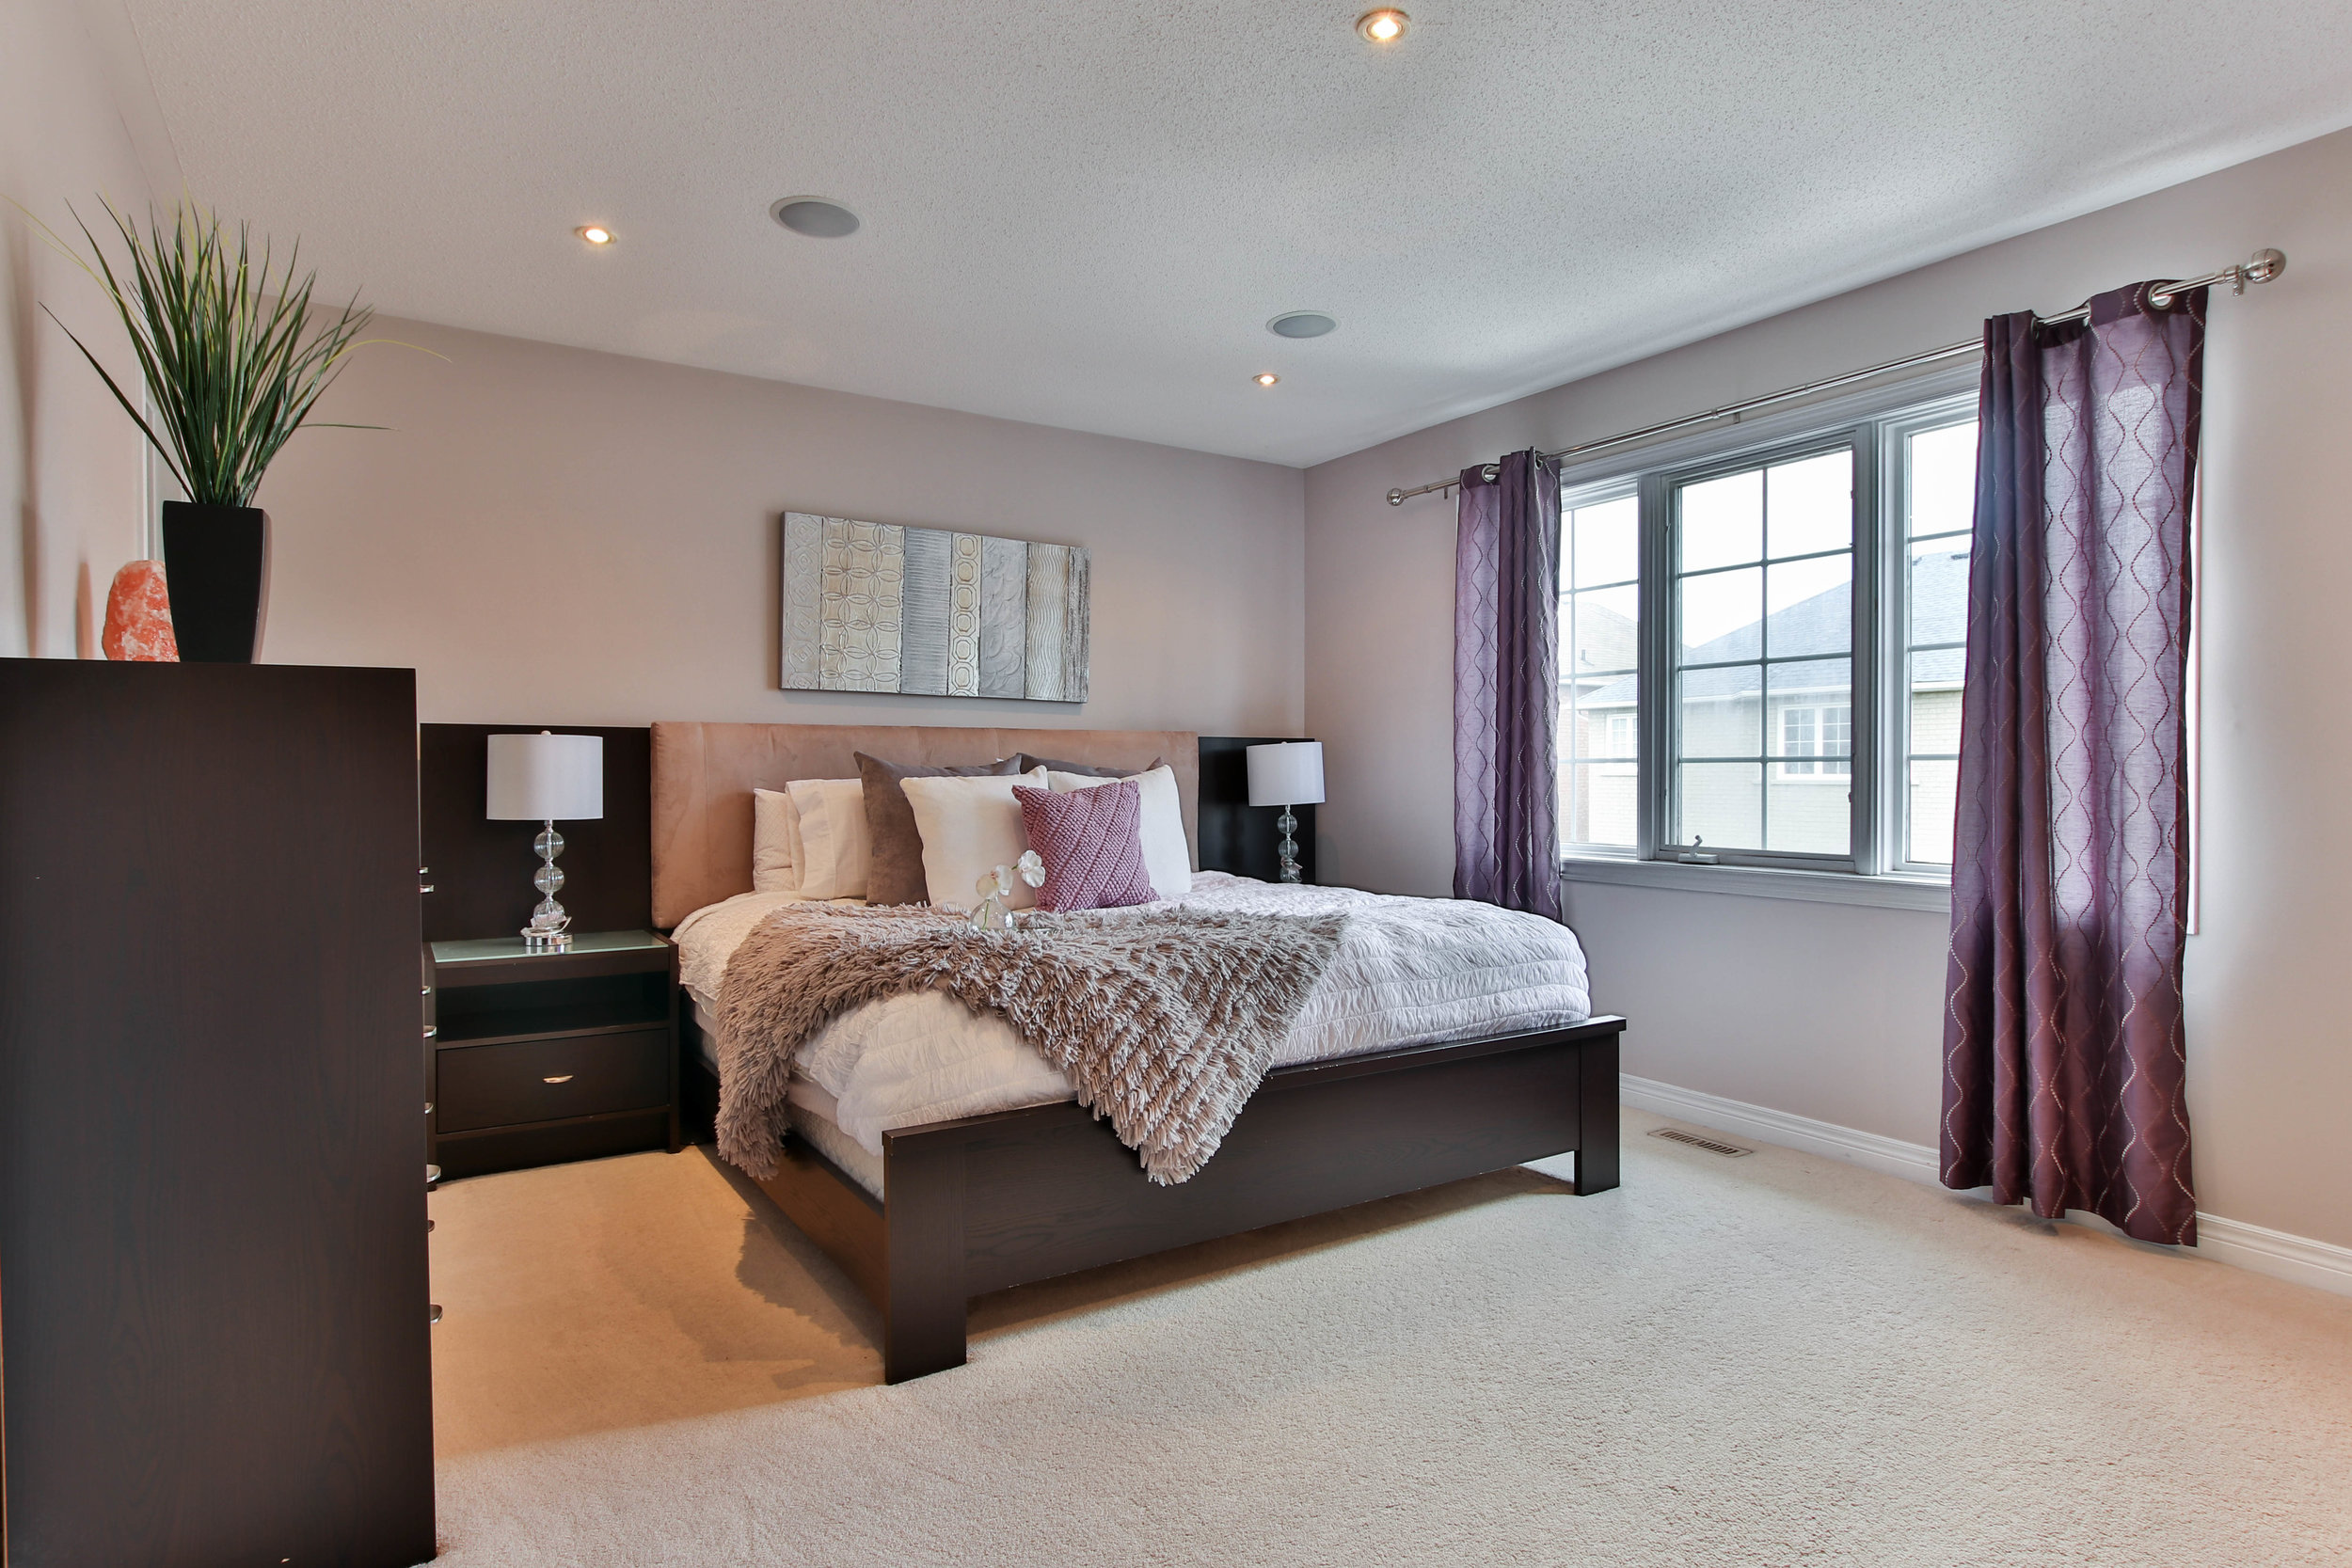 35_Bedroom (1 of 1).jpg